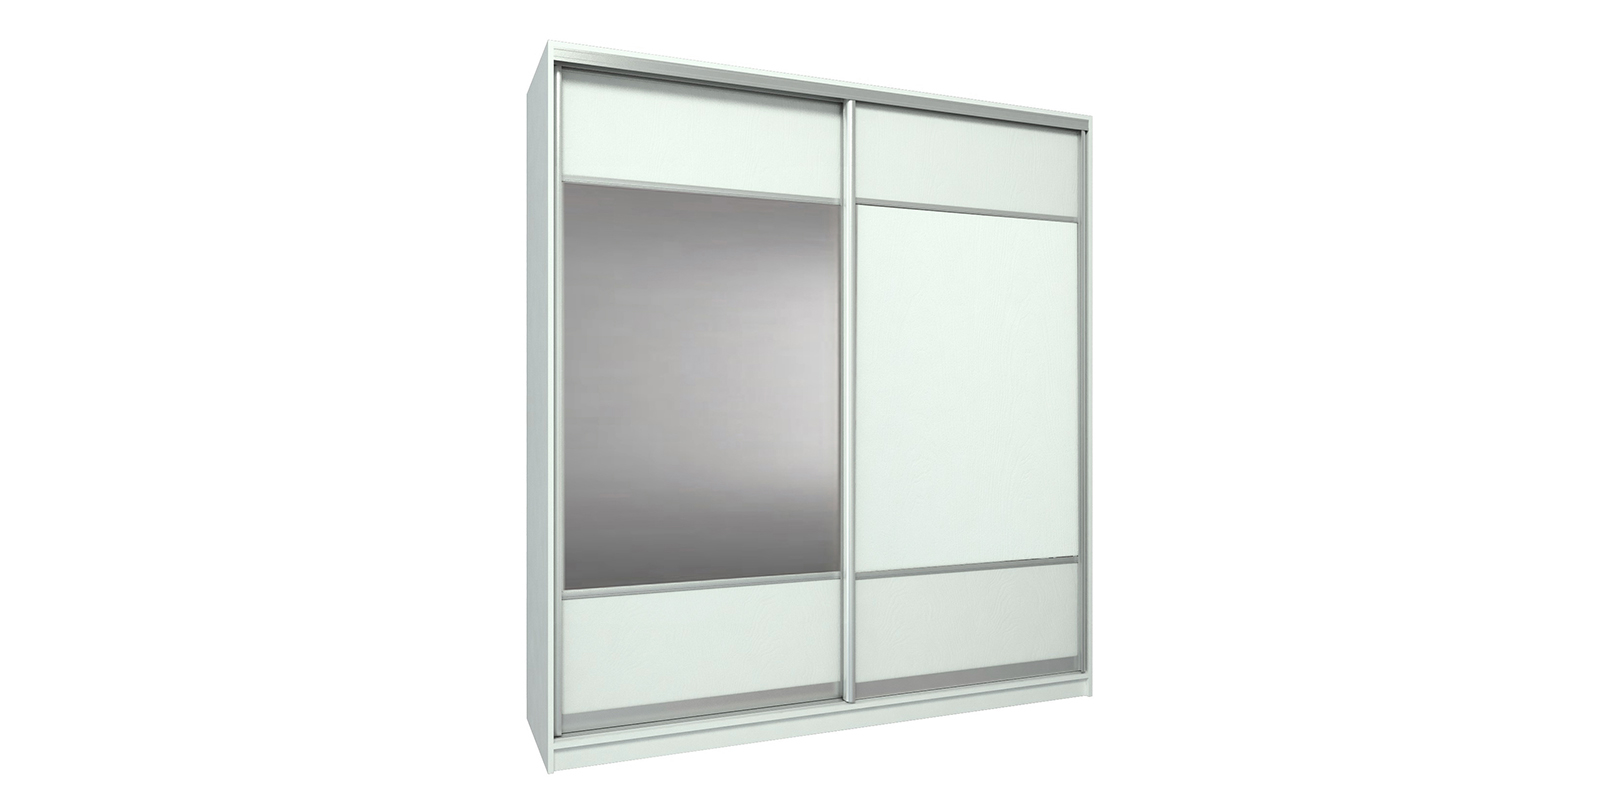 Шкаф-купе двухдверный Бостон 200 см (белый+зеркало)